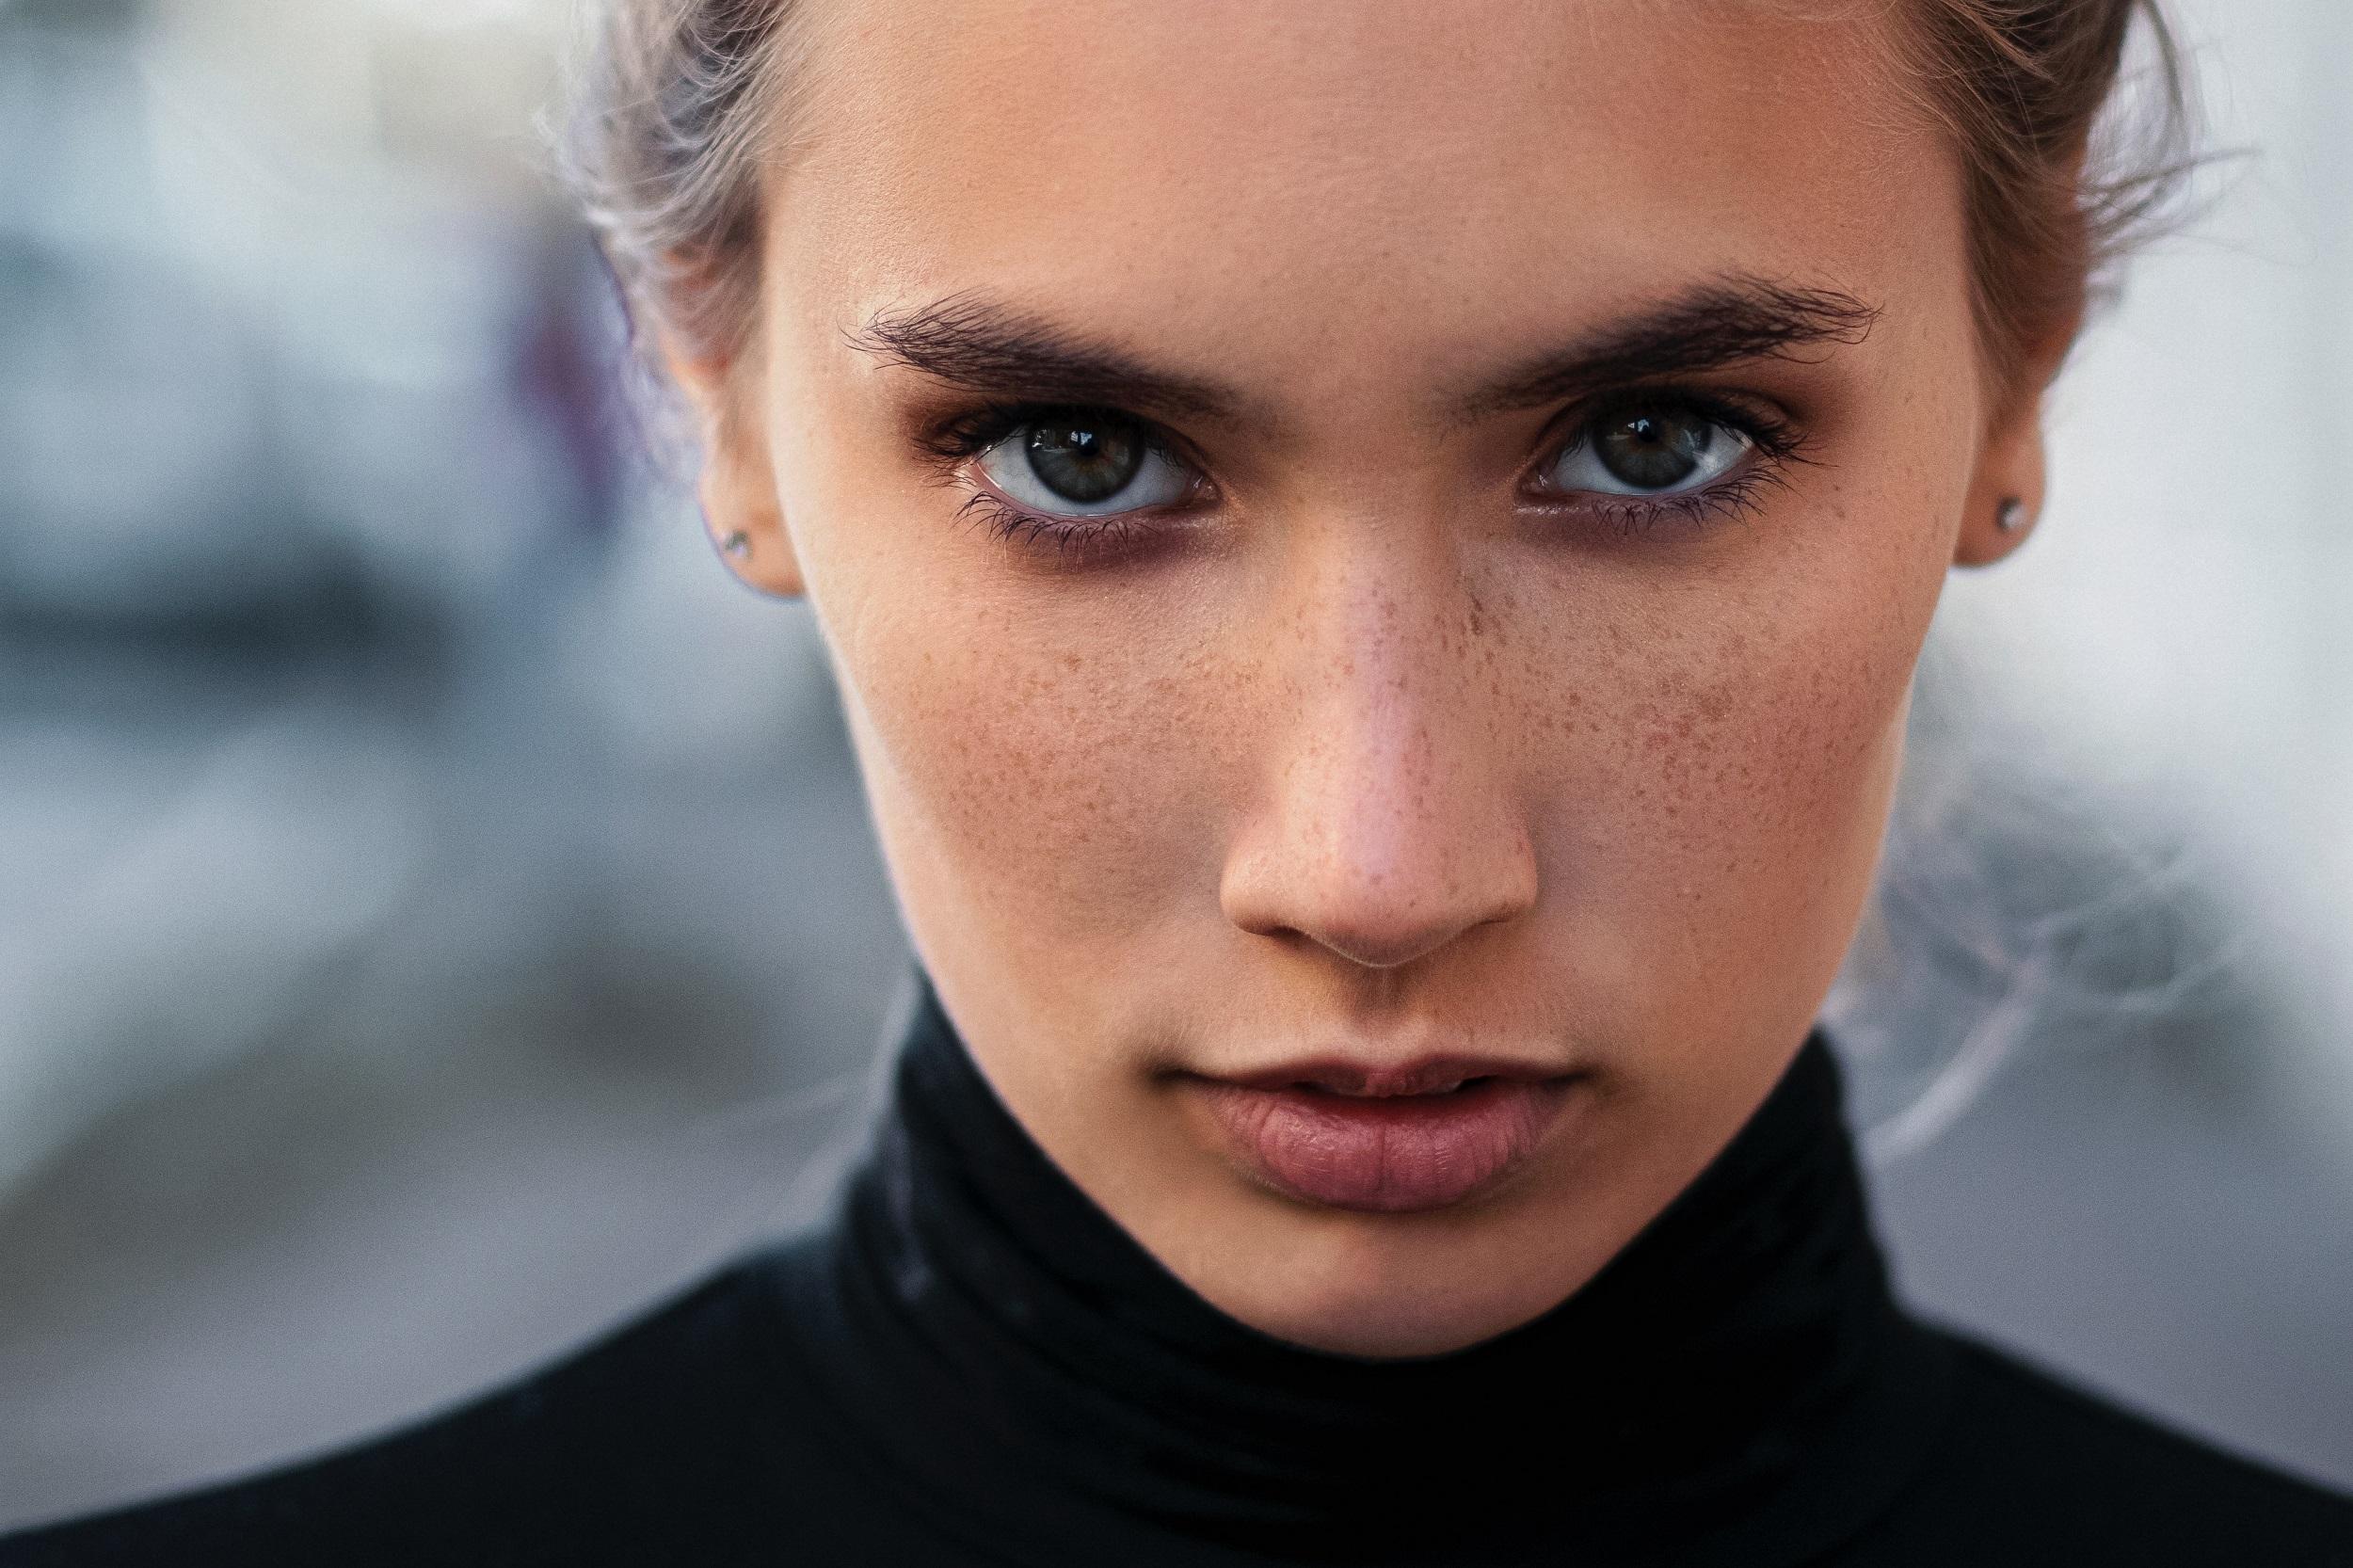 brosse-nettoyante-visage